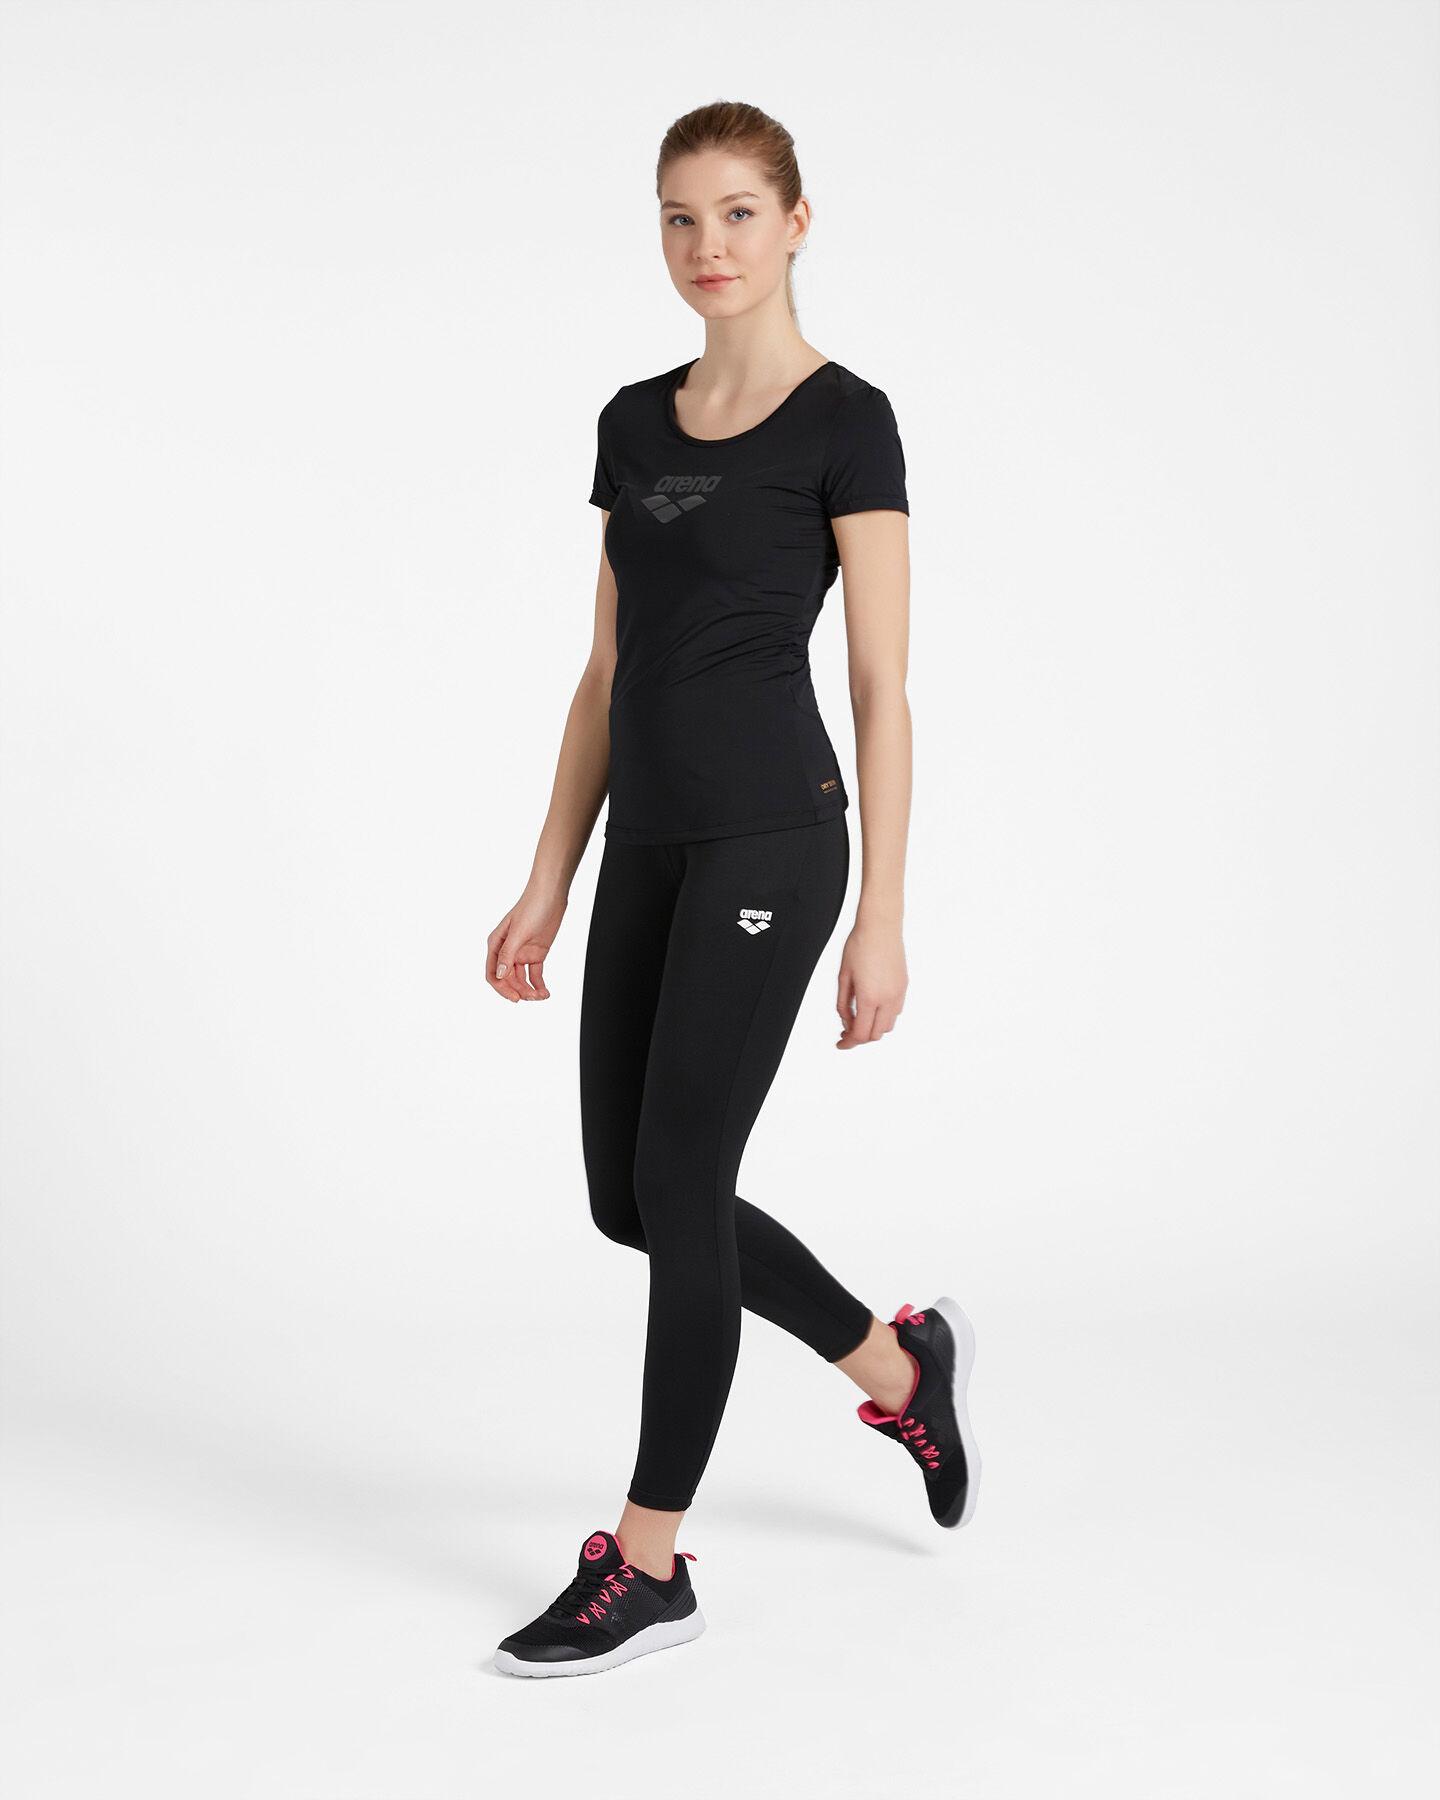 T-Shirt training ARENA CARRE' RETRO MESH W S4087237 scatto 3